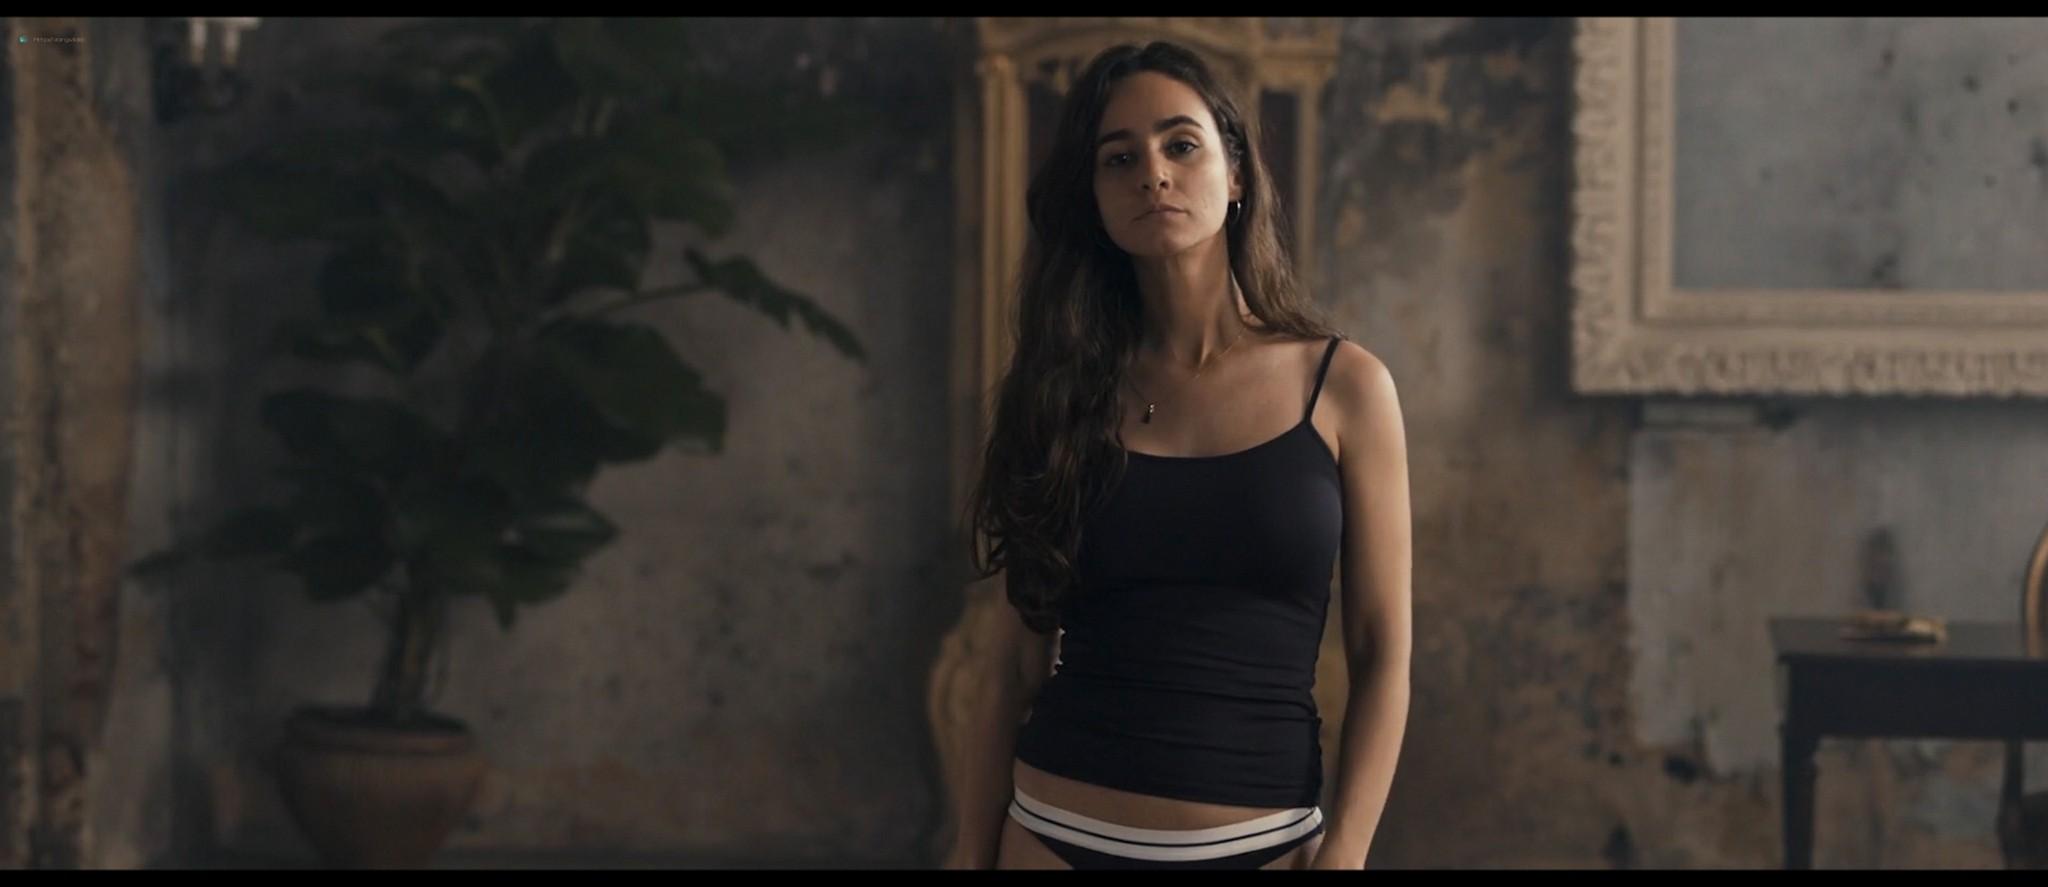 Alicia Sanz nude hot sex - En Brazos de un sesino (2019) HD 1080p Web (13)